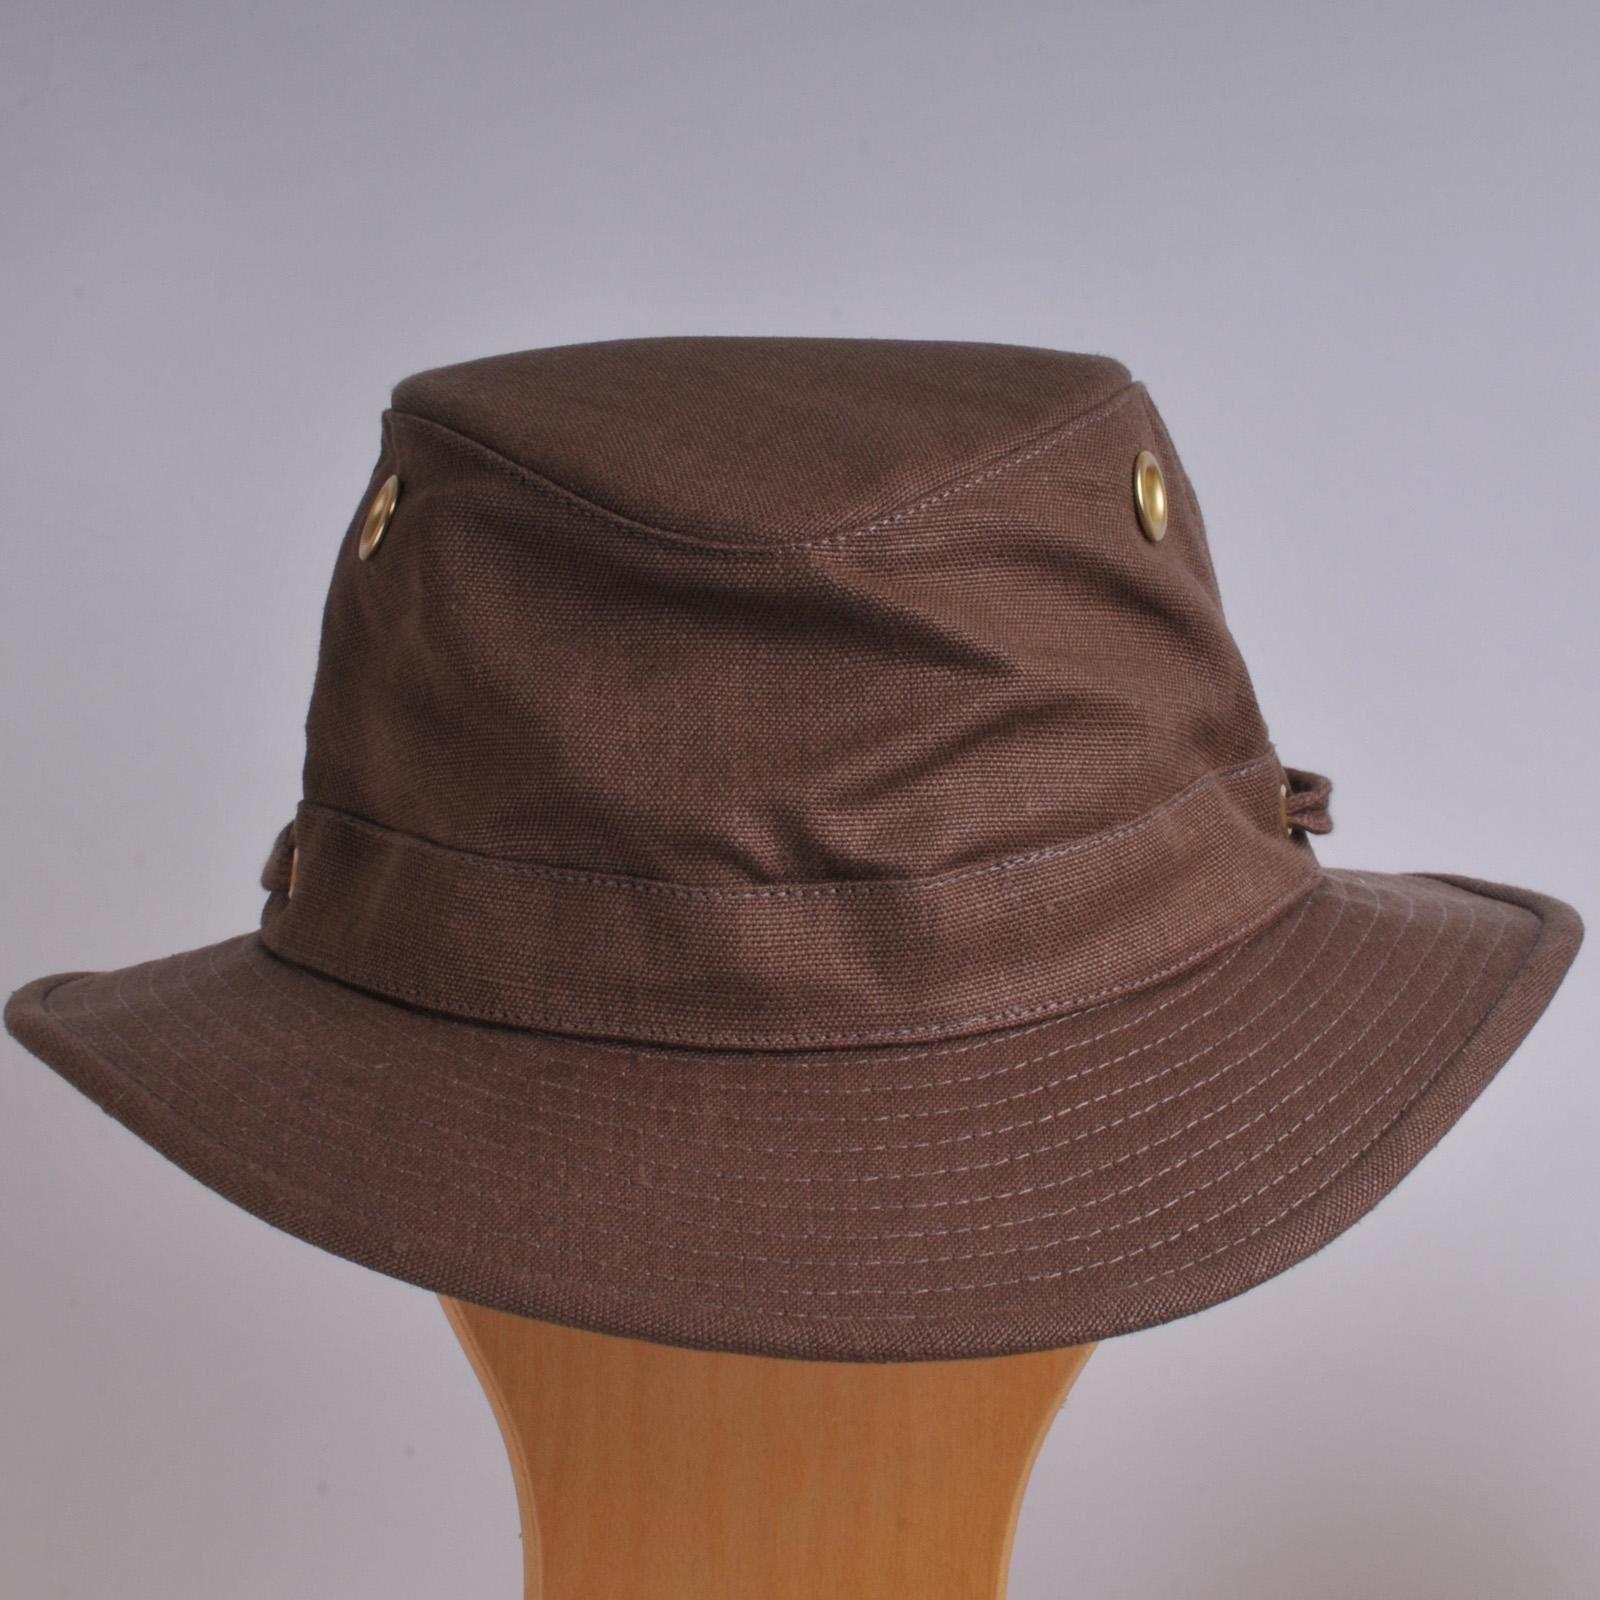 8ccd279c1e081 Hemp Tilley Hat TH5 Mocha